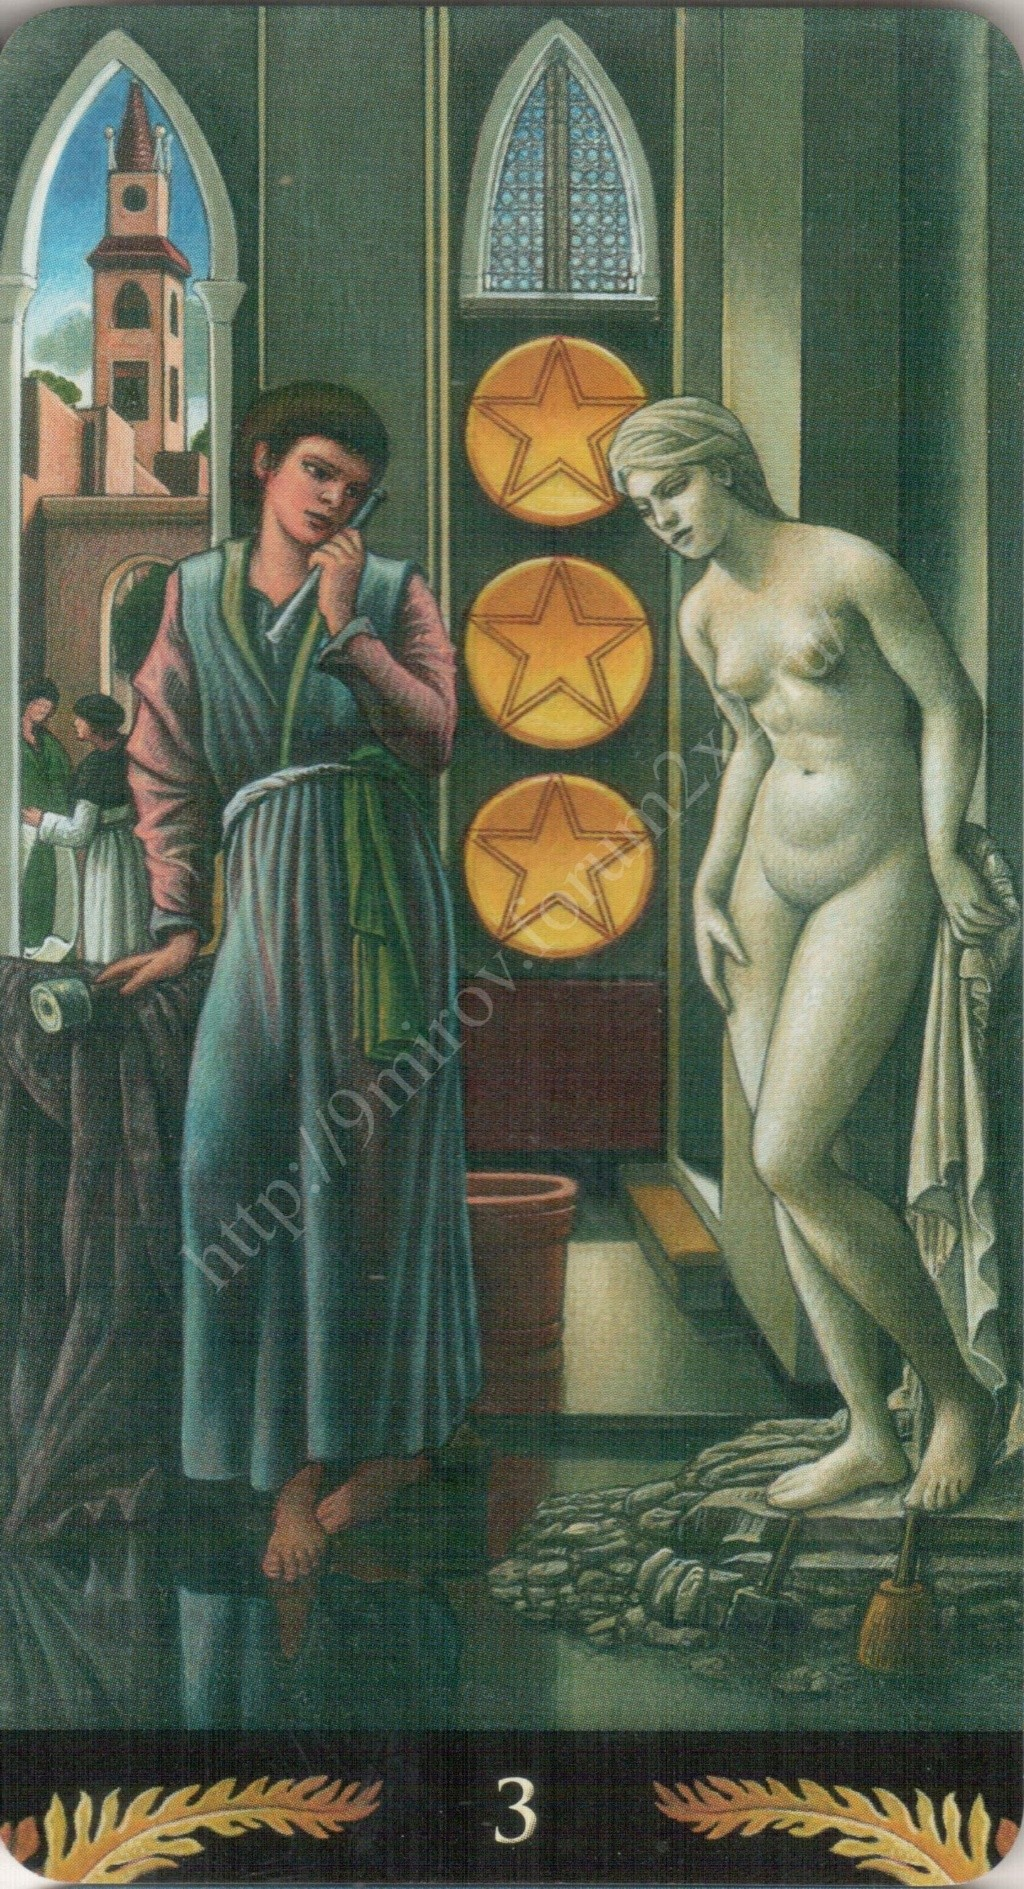 Таро Прерафаэлитов (Pre-Raphaelite Tarot) Галерея Water401